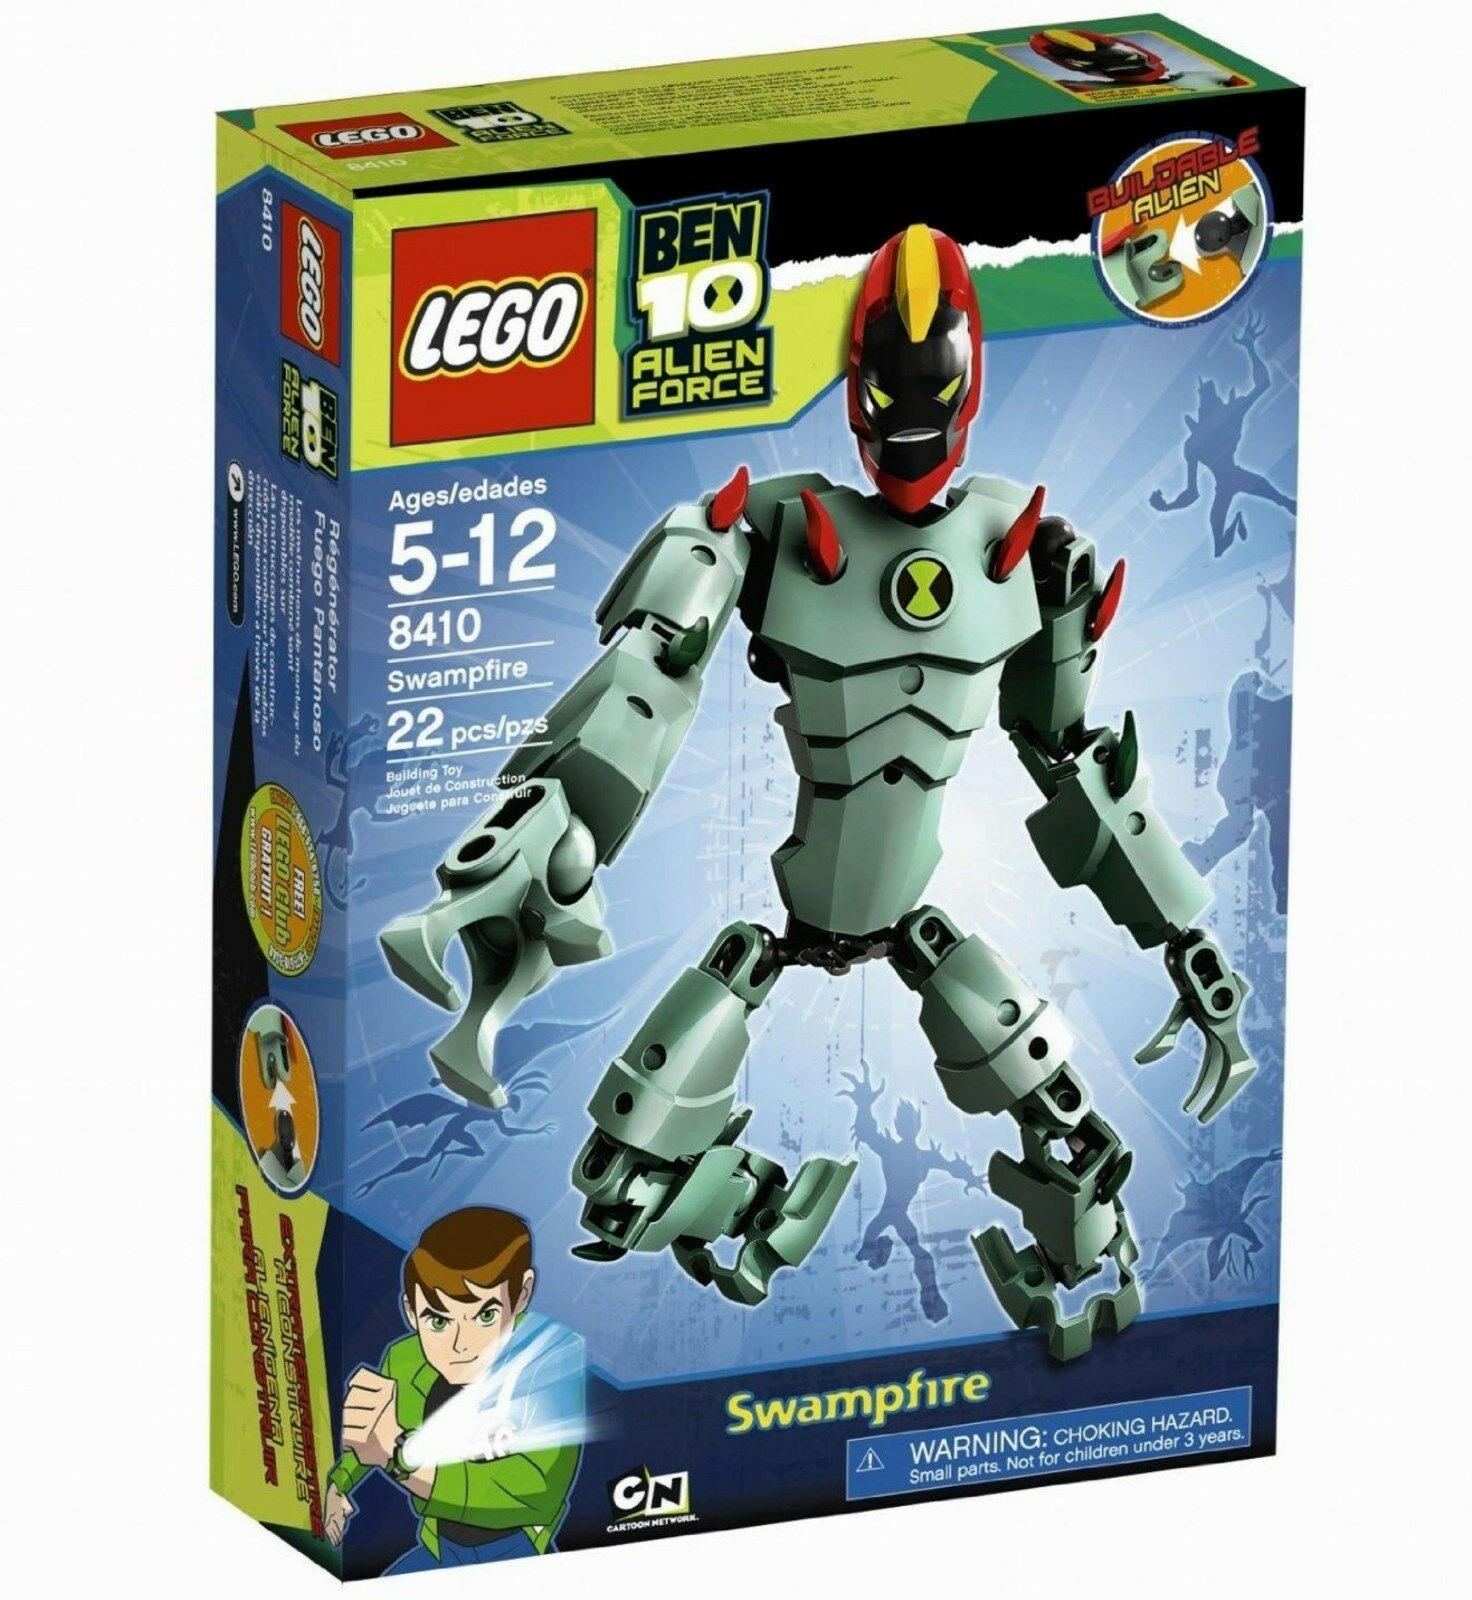 Lego Ben 10 Alien Force Swampfire NEUF  8410 voituretoon Network 22 pieces  obtenir la dernière